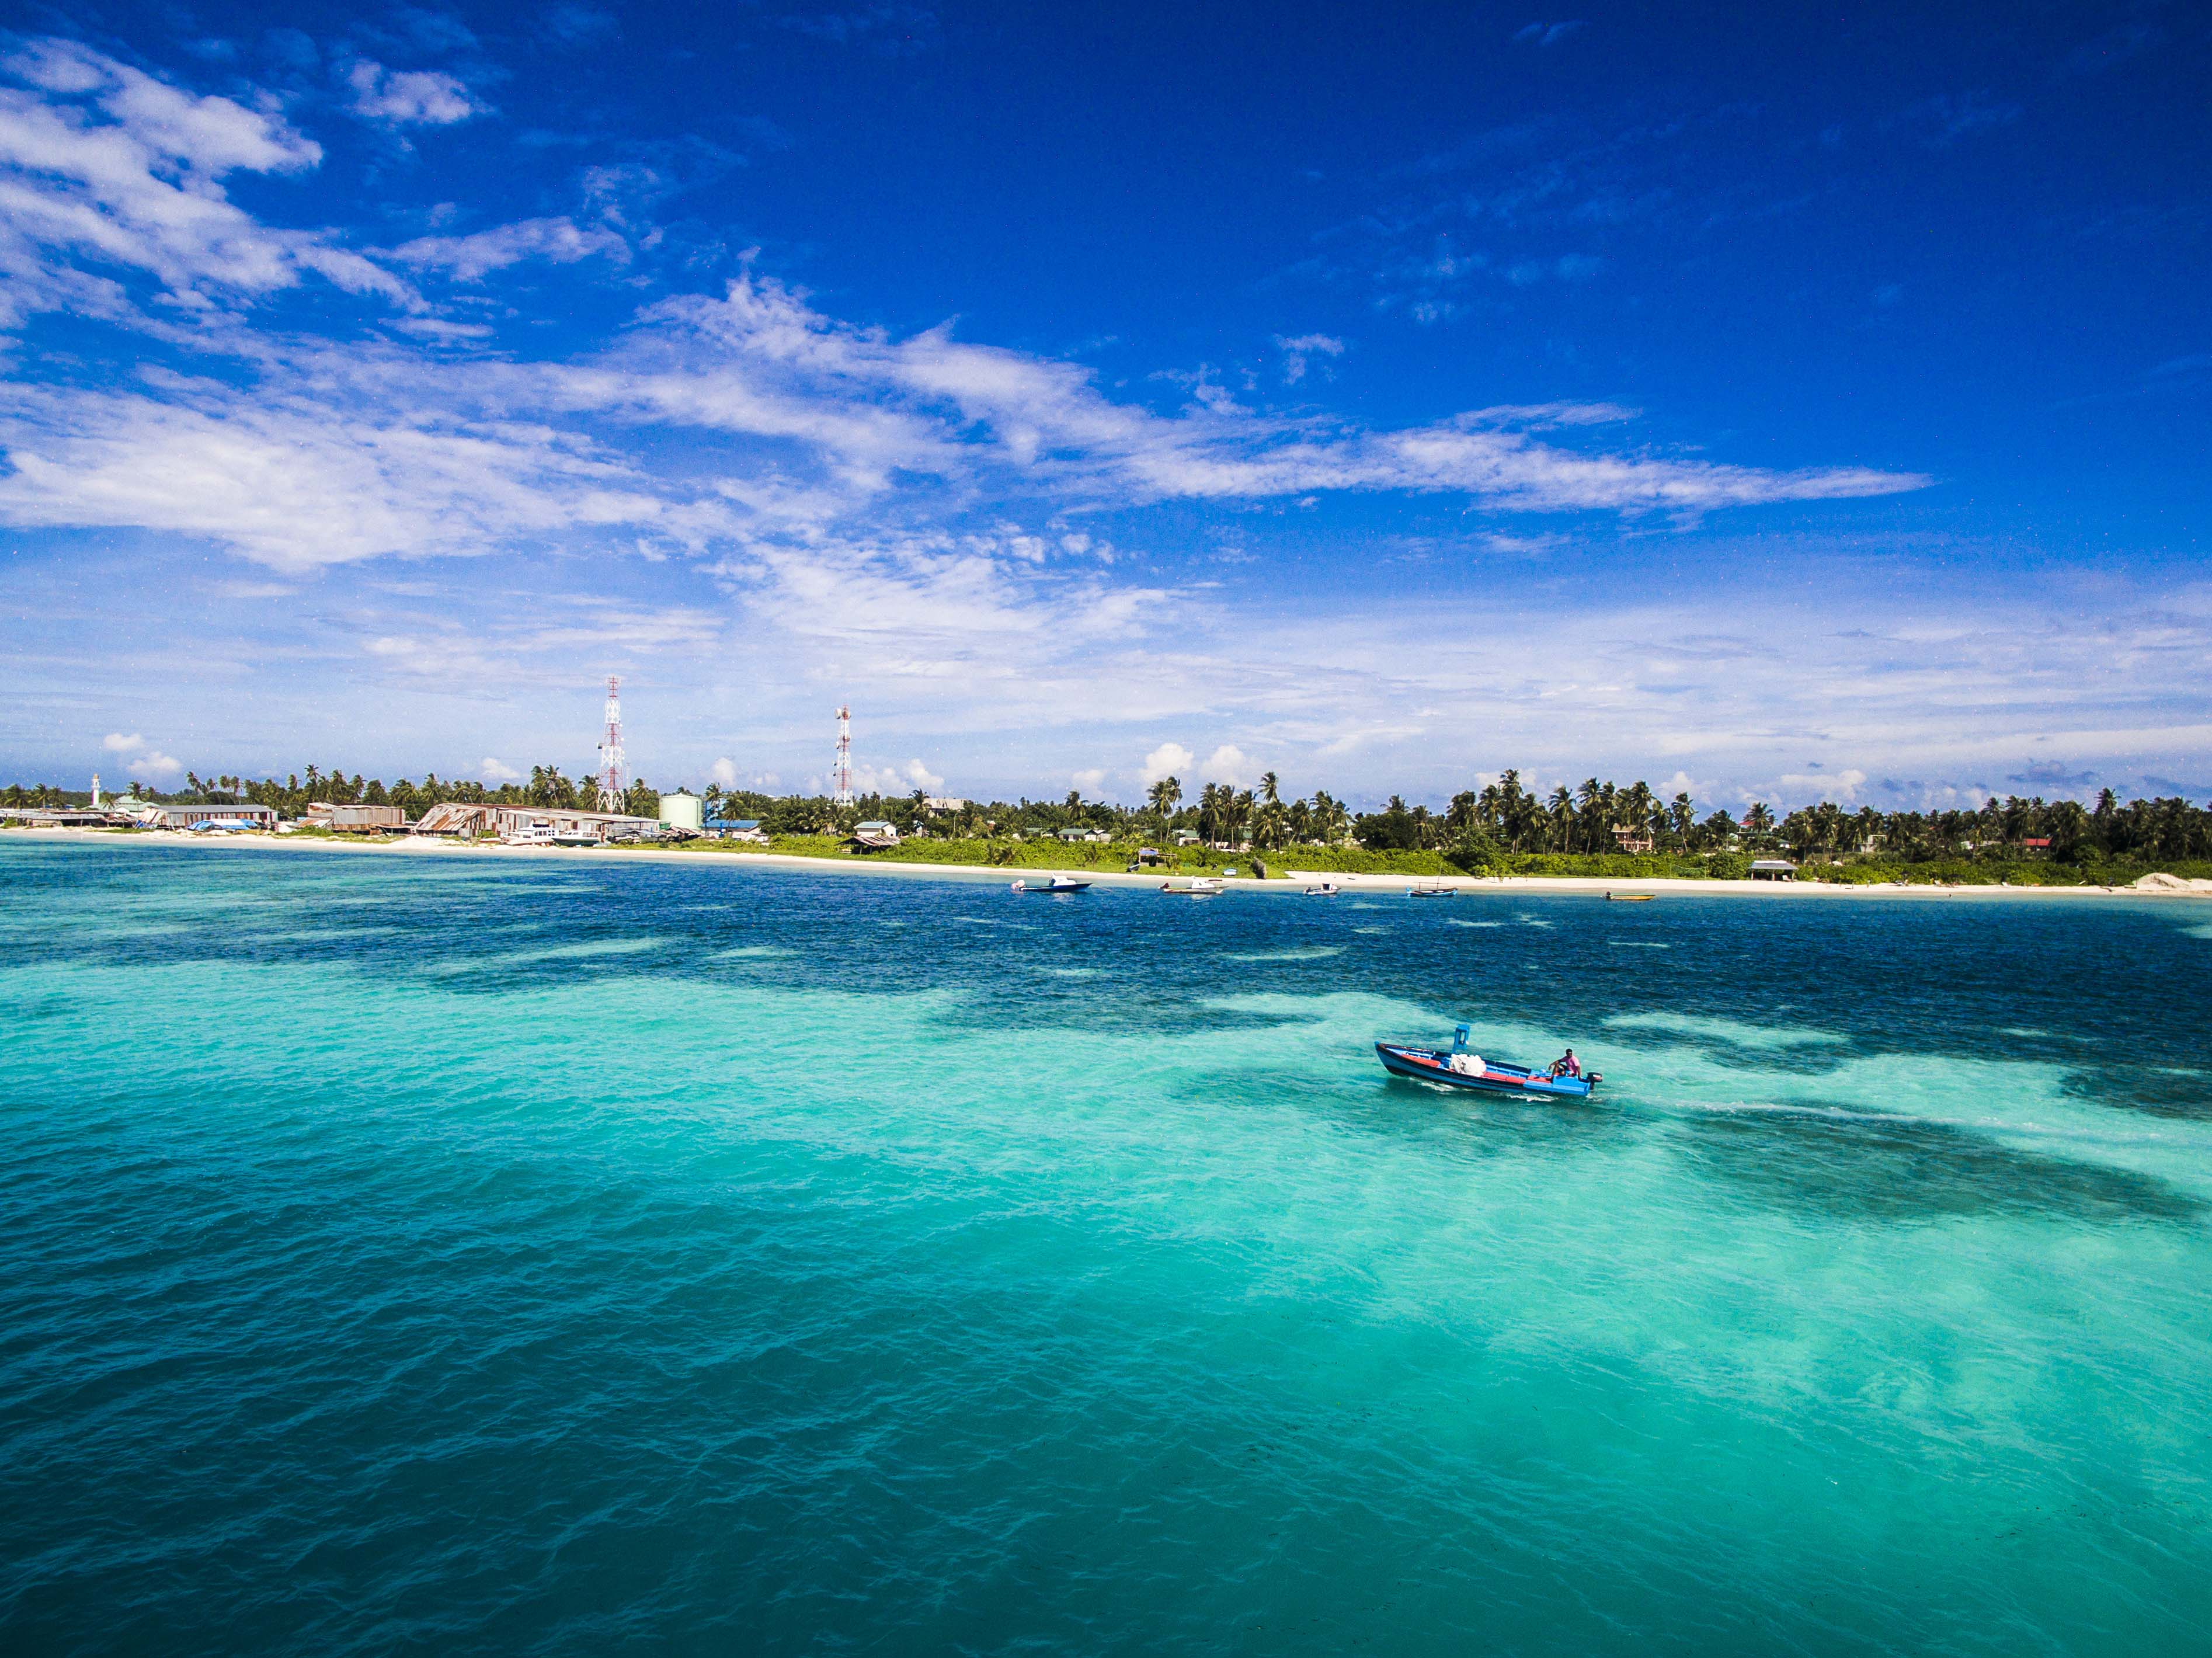 Lacabana Maldives  A Dh Maamigili Island (17)